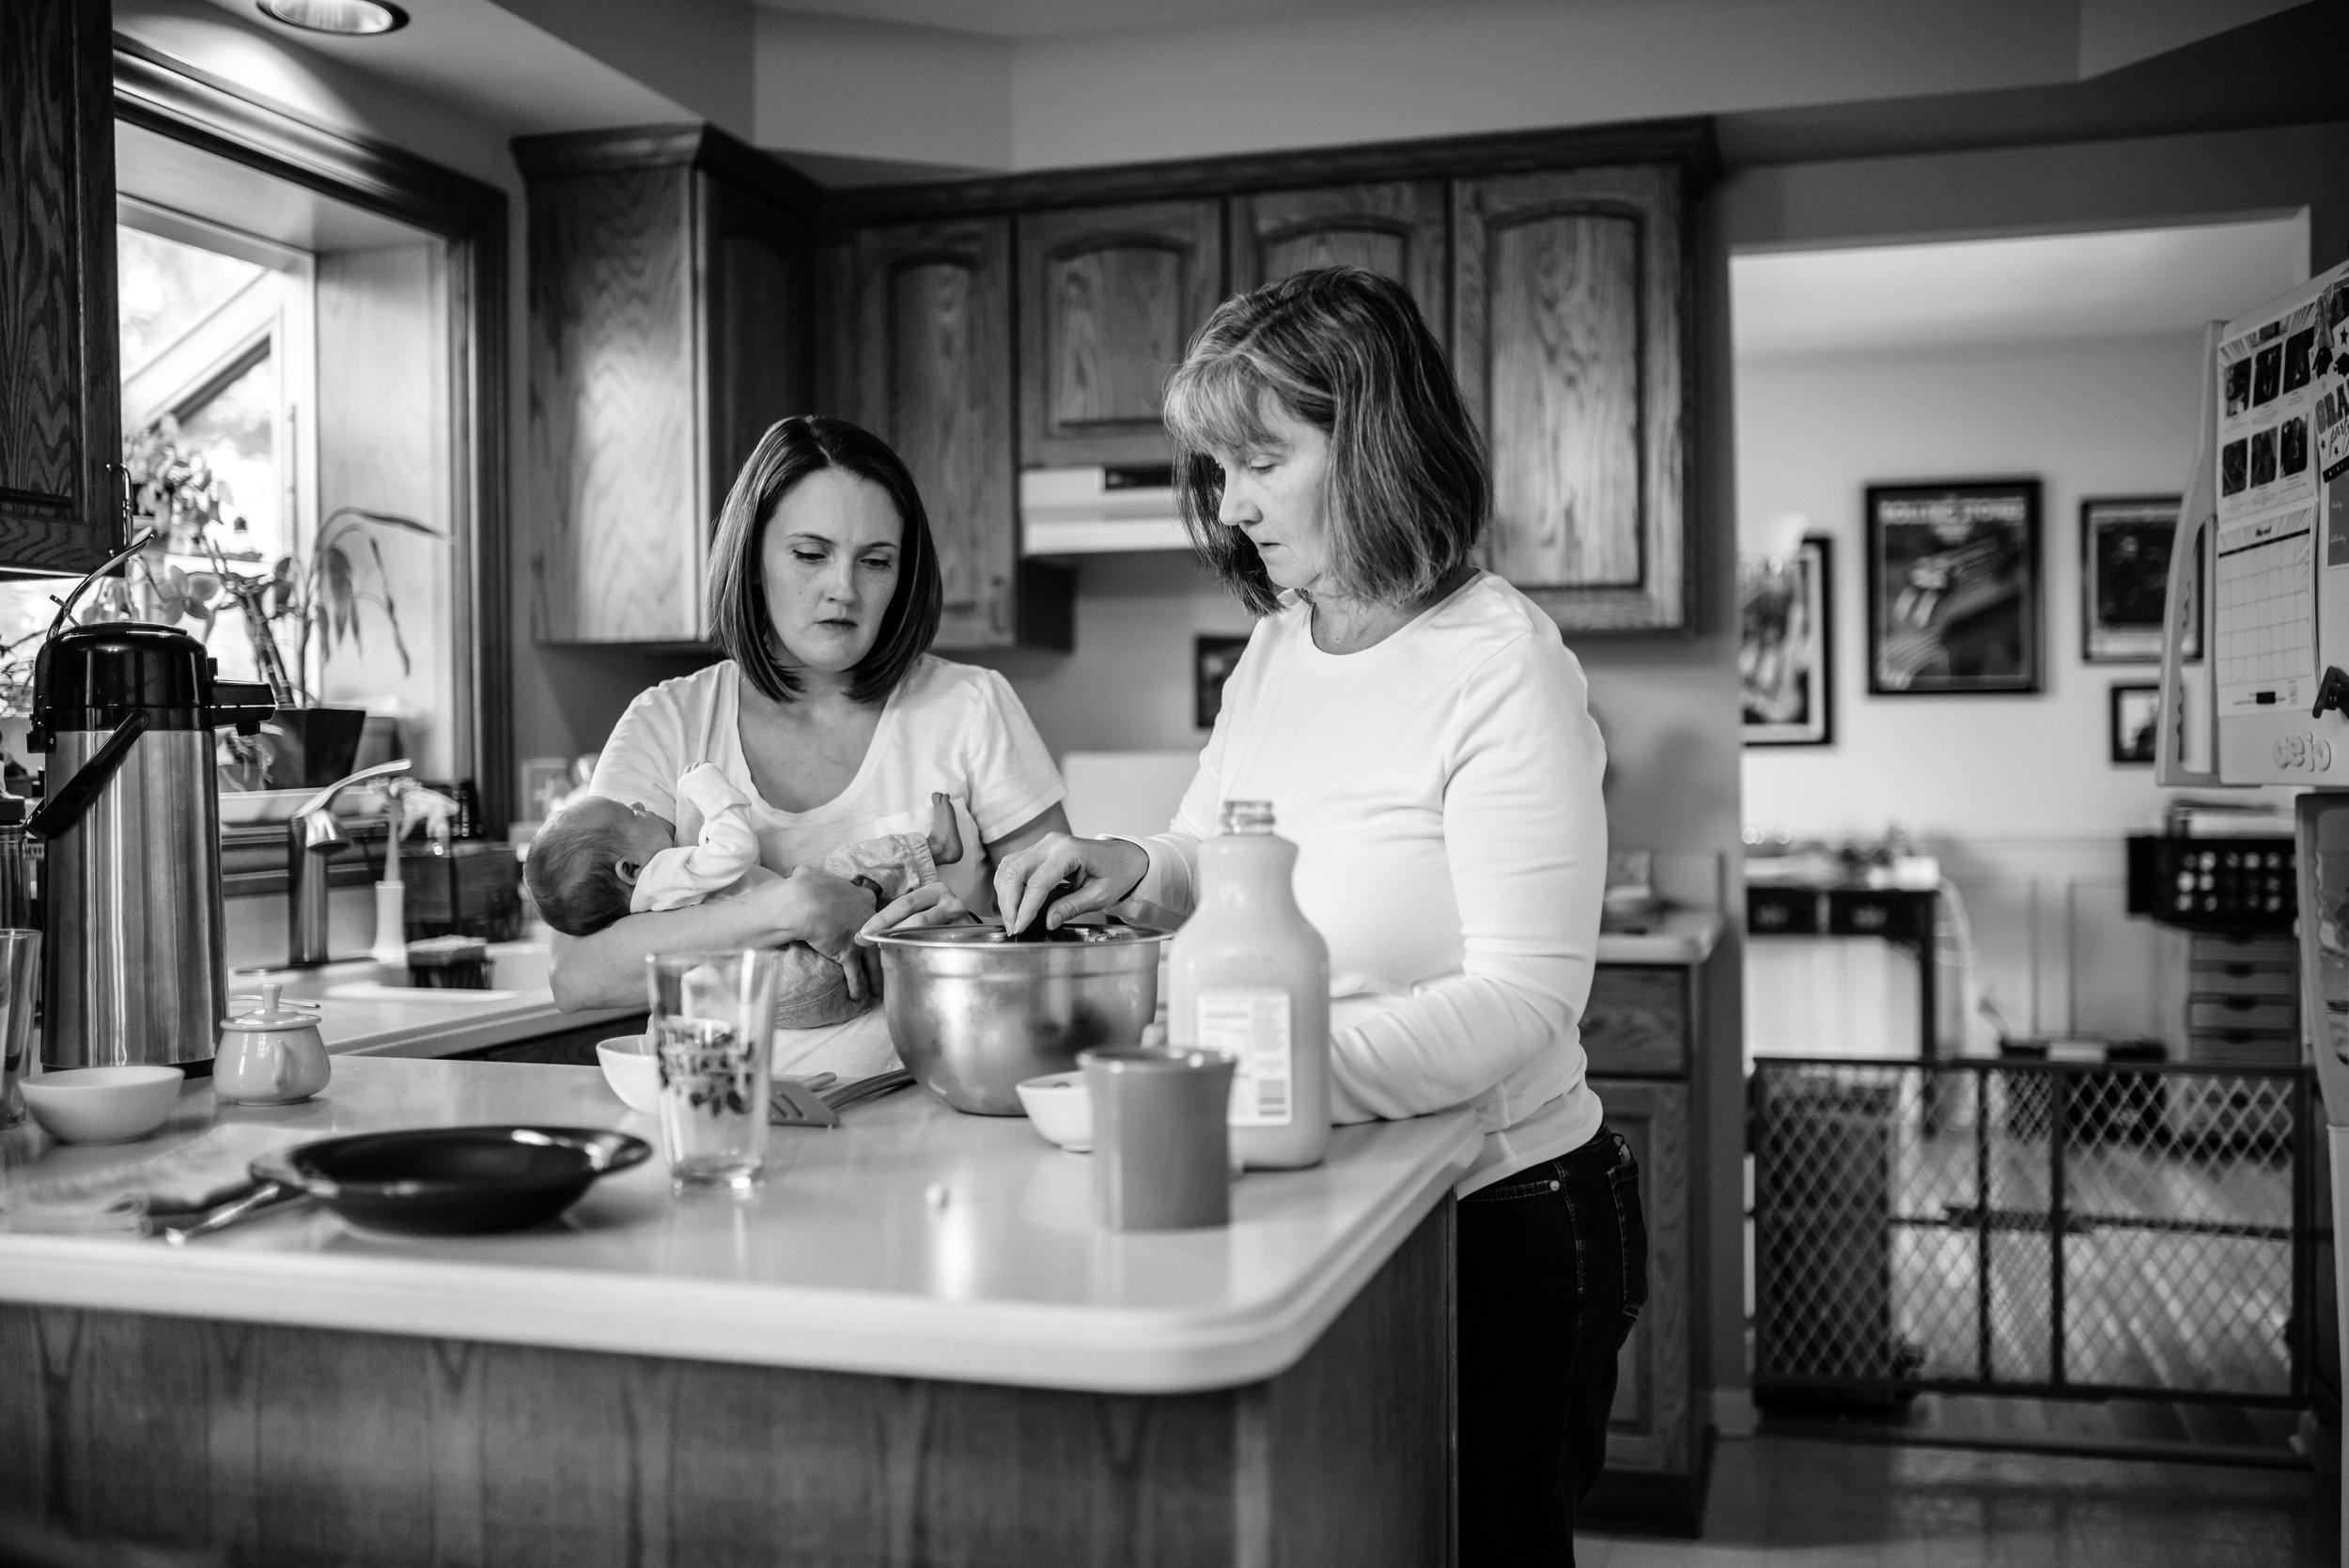 Mom holds baby as she preps breakfast with Grandma